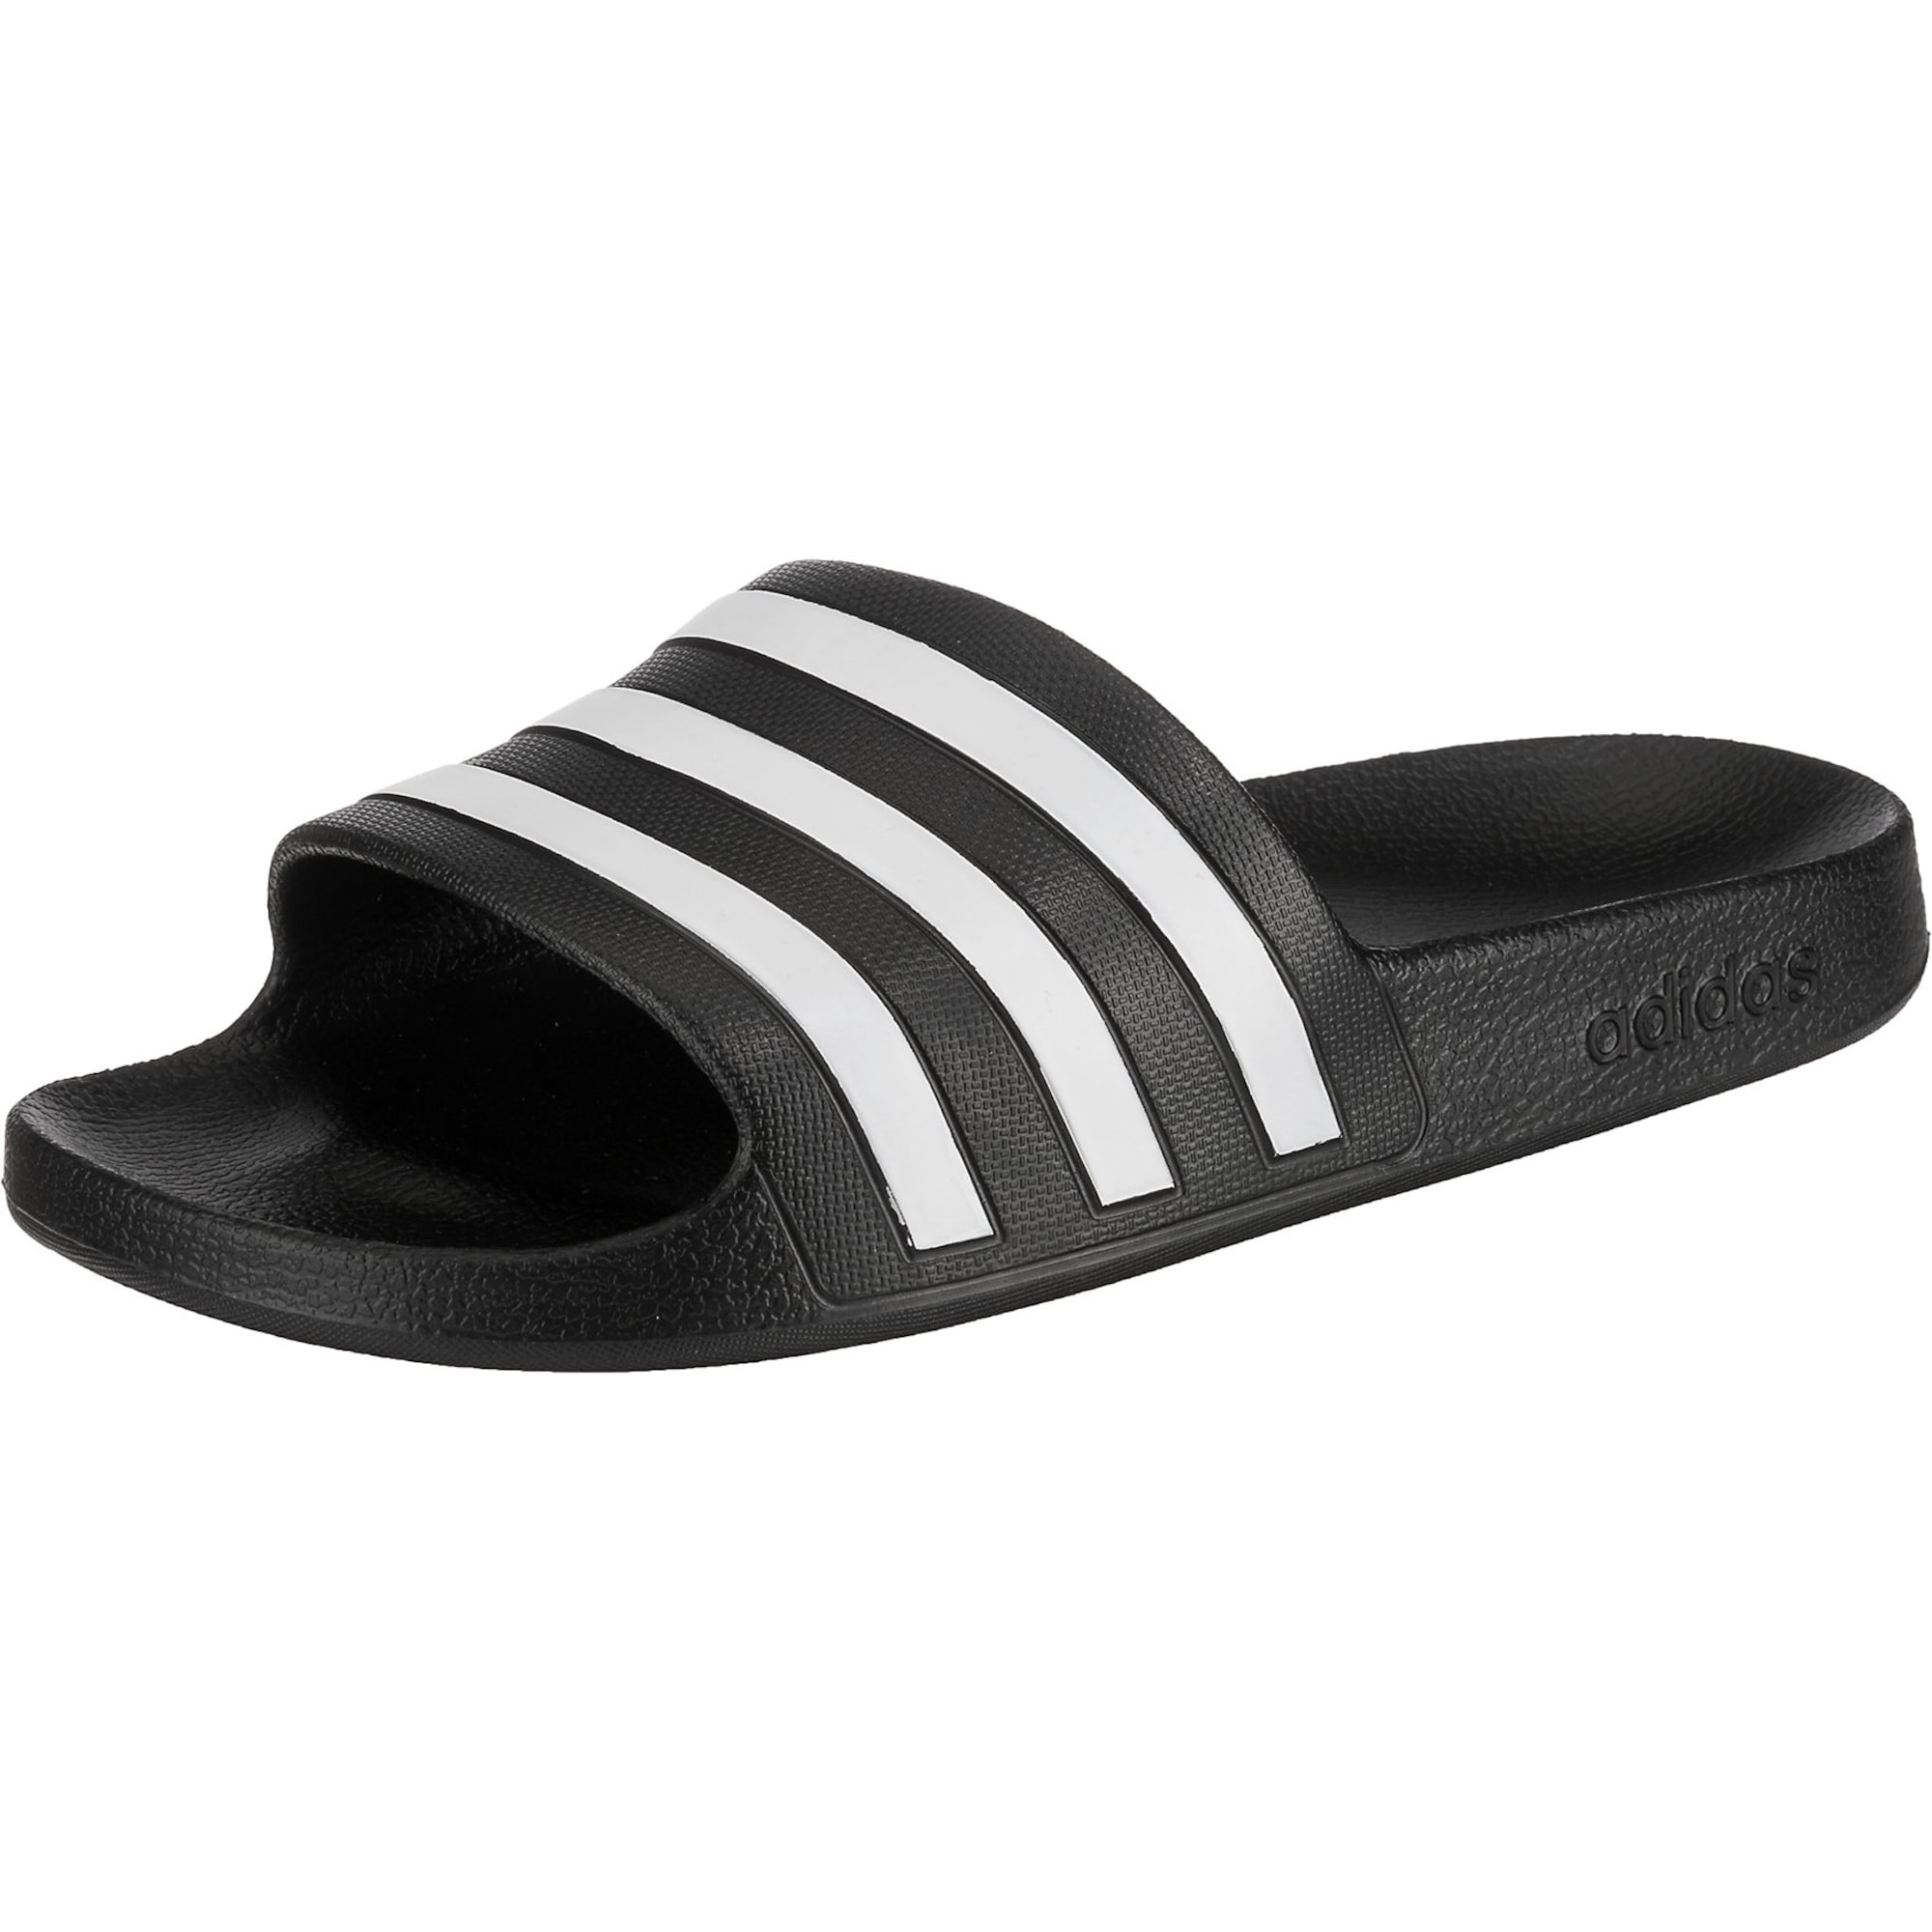 Plážovákoupací obuv Adilette Aqua schwarz weiß ADIDAS PERFORMANCE